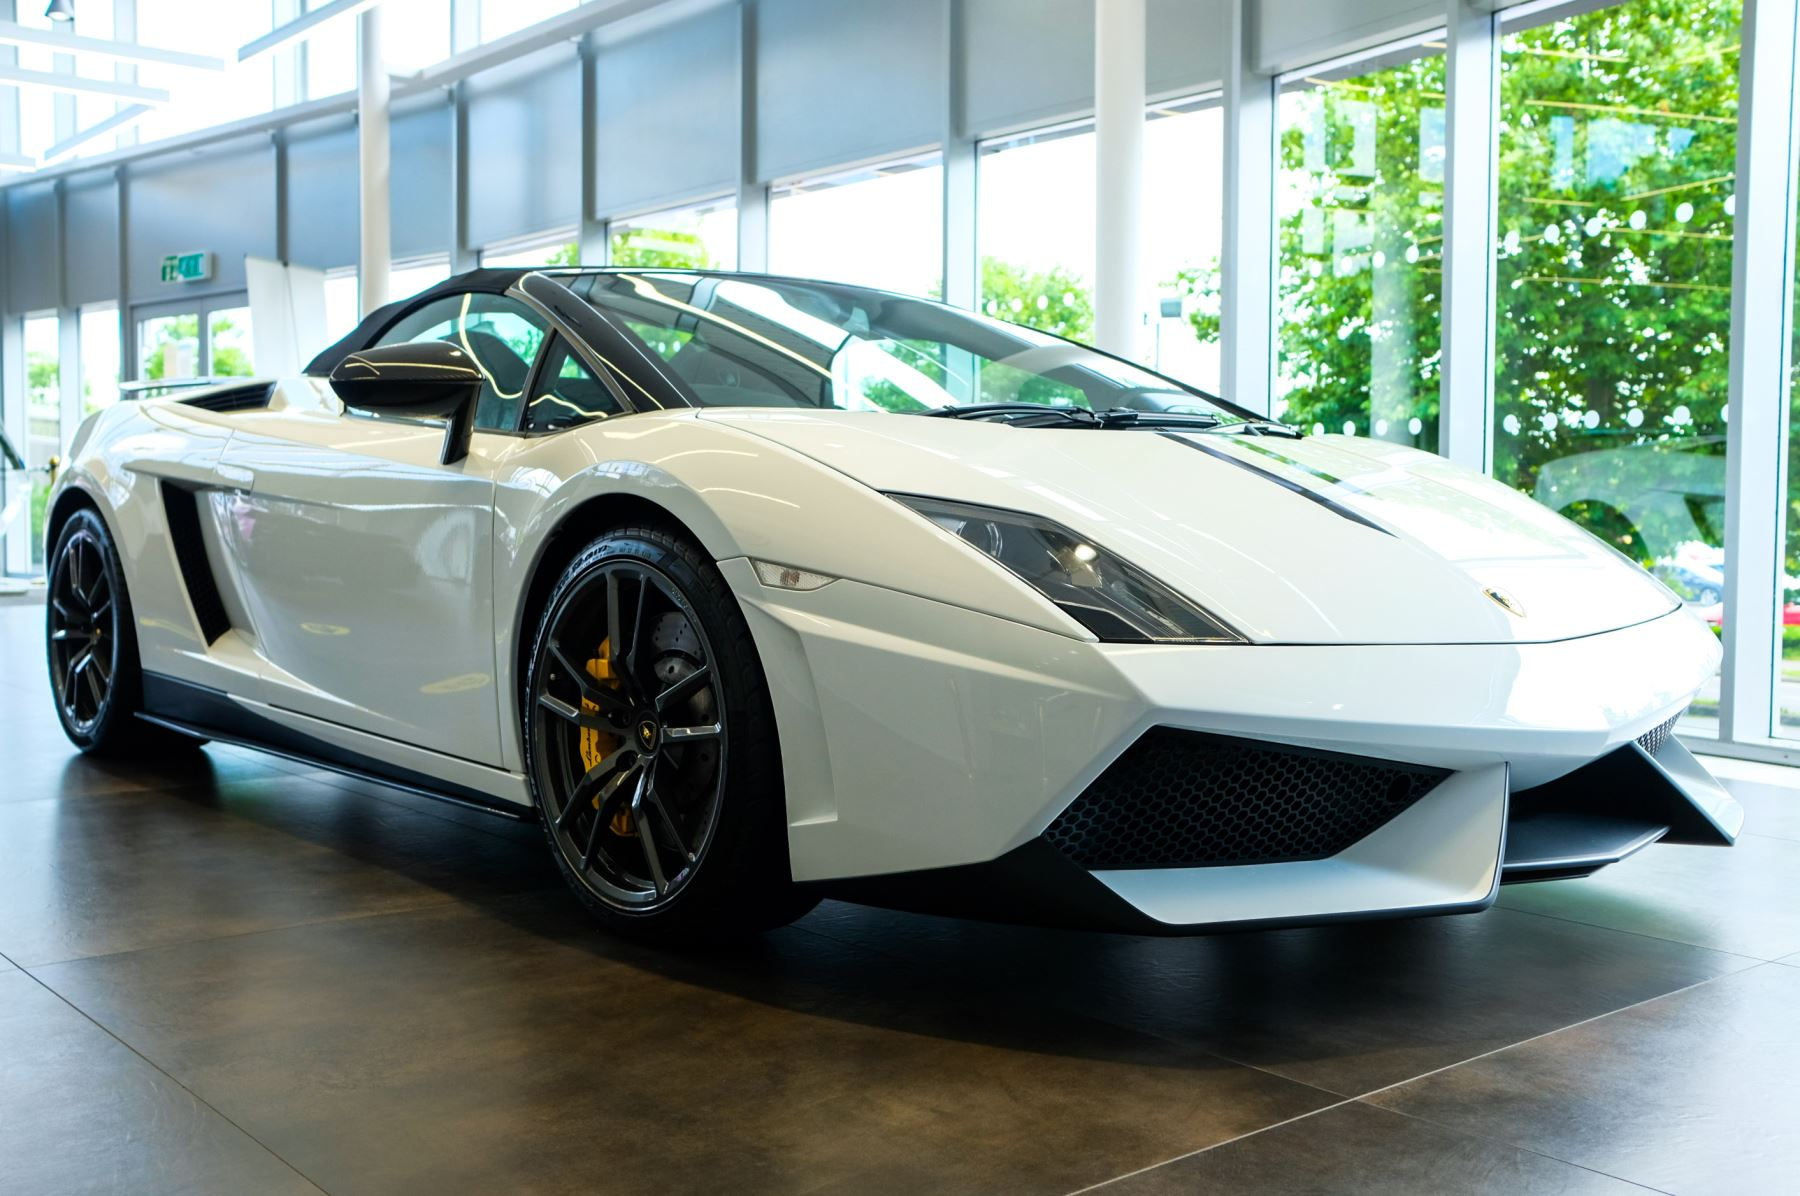 Lamborghini Gallardo LP 570-4 Performante Spyder E Gear 5.2 Automatic 2 door Convertible